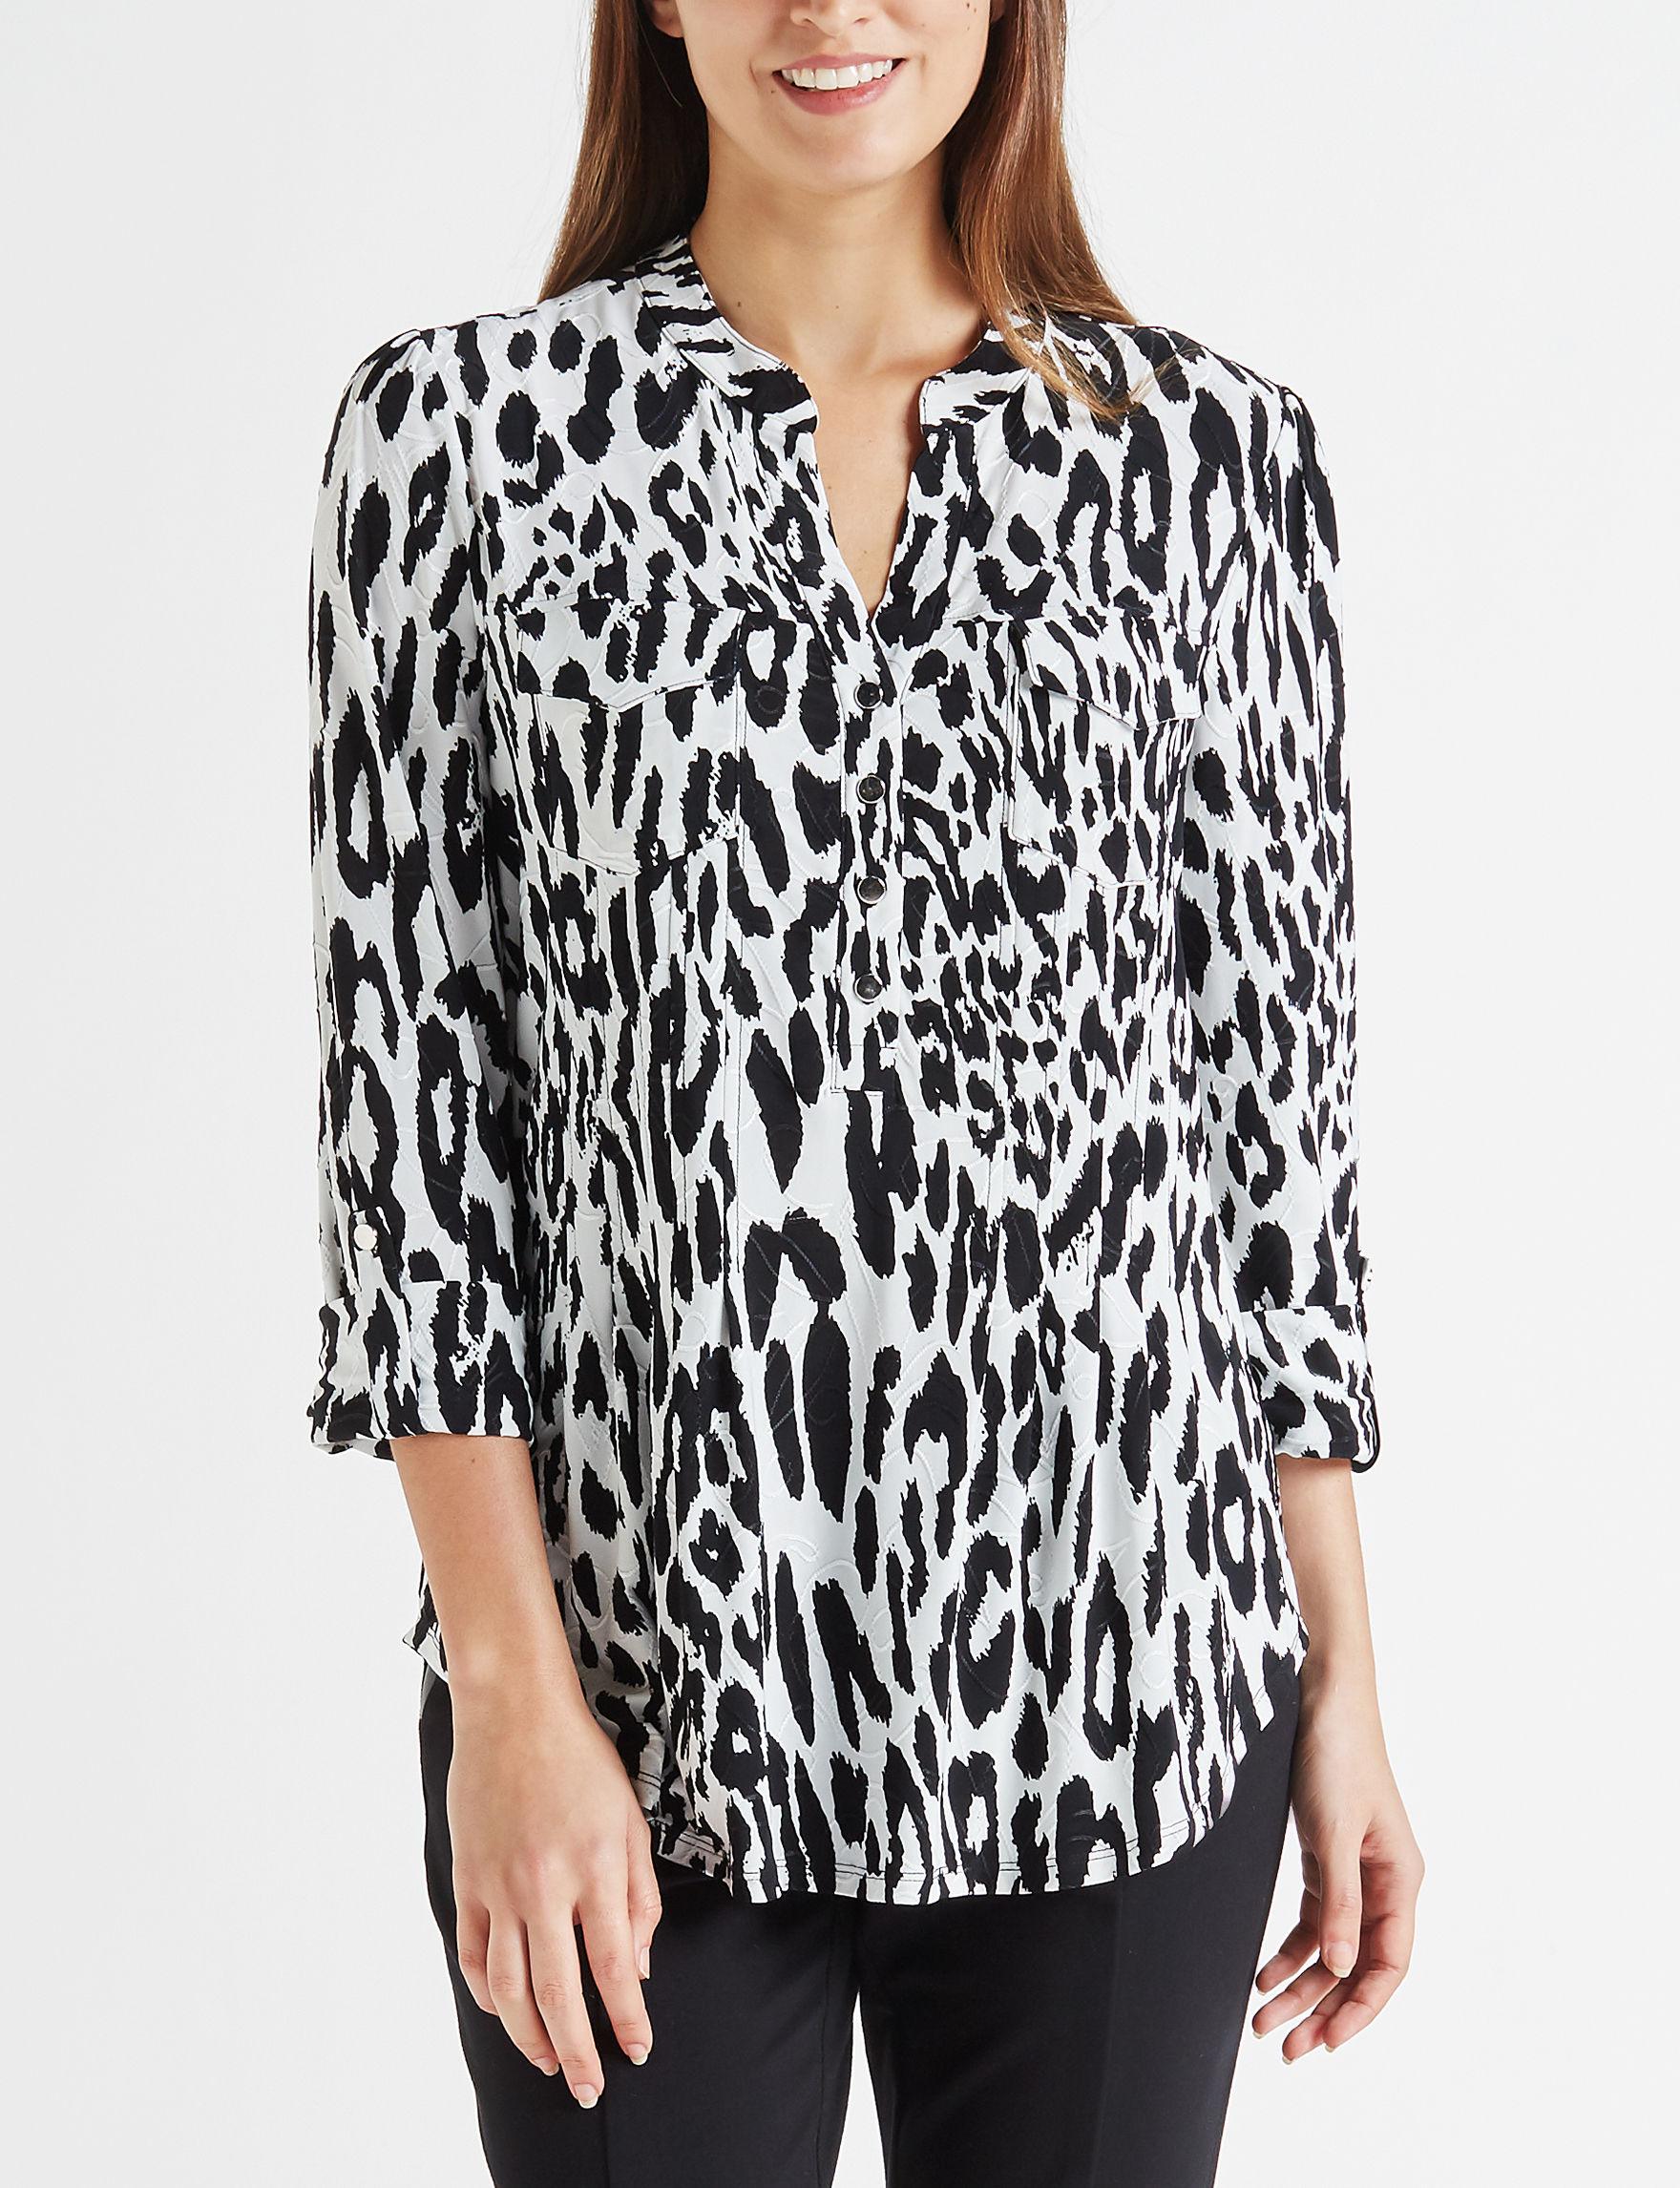 Verarose White / Black Shirts & Blouses